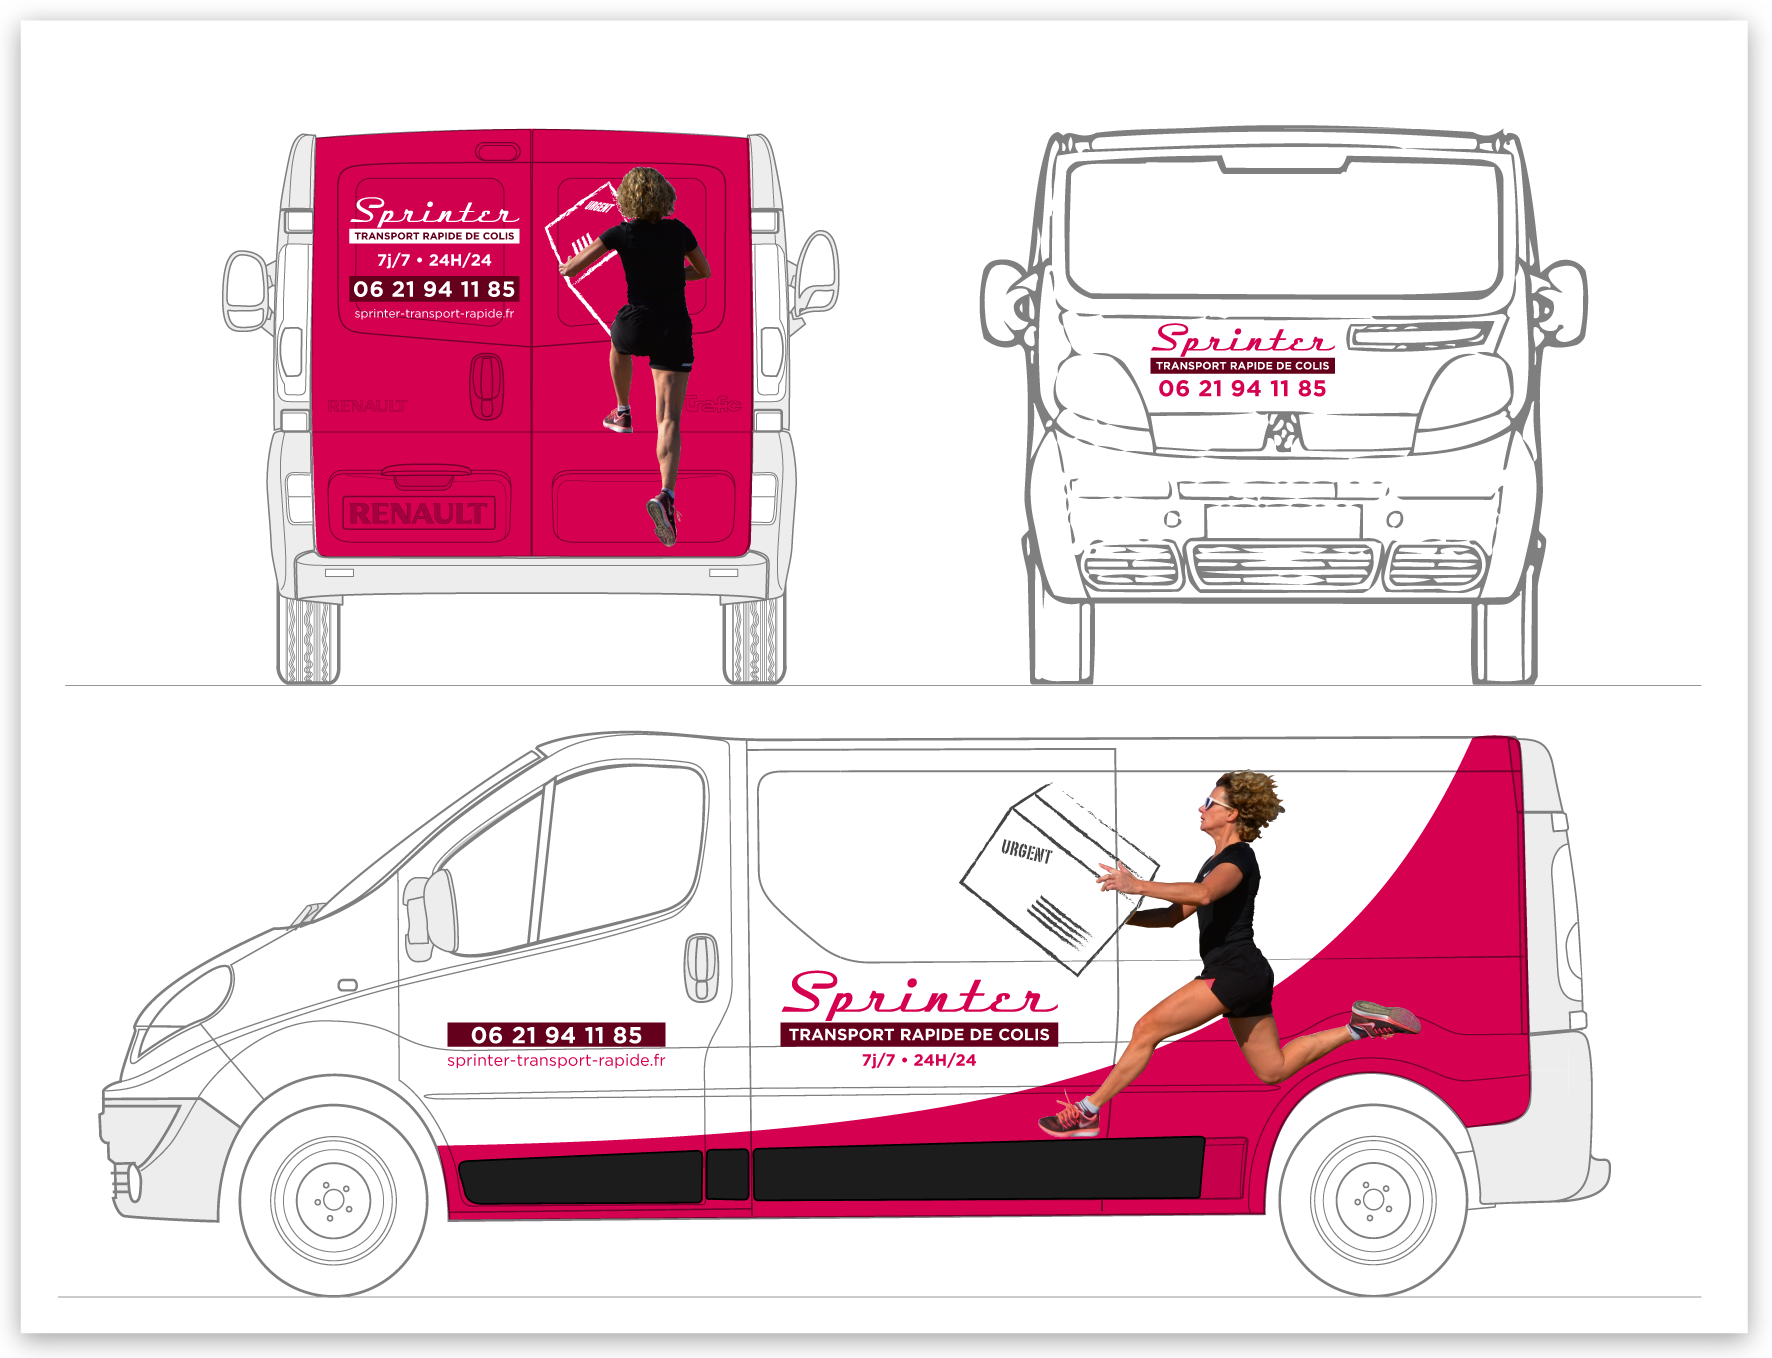 flocage-renault-trafic-sprinter-2015